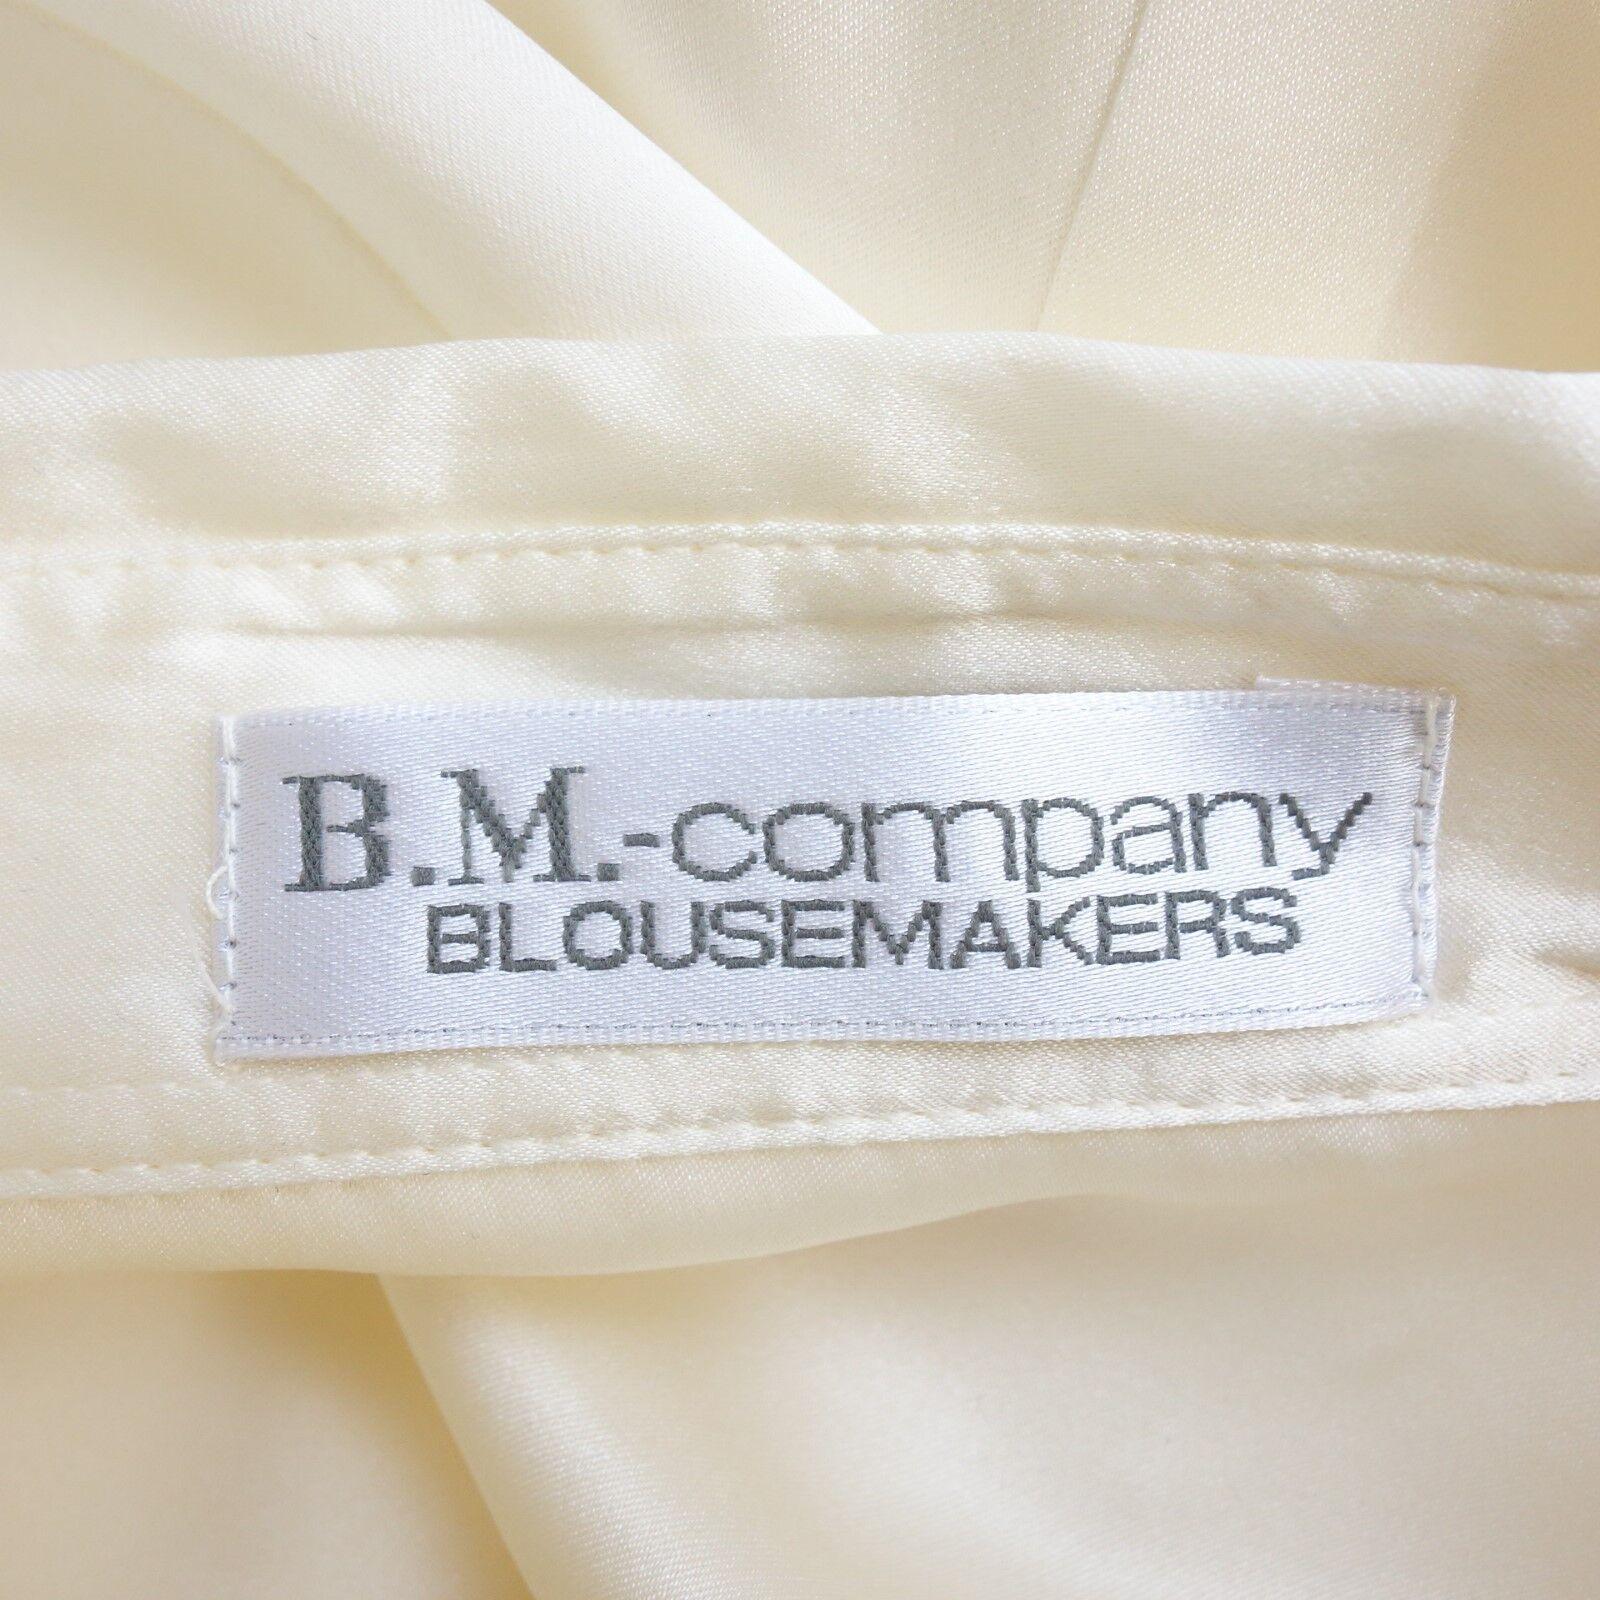 BM BLOUSEMAKERS COMPANY Blause Blause Blause Damen 40 Ivory SeidenBlause Reine Seide NP 230 NEU b14c32